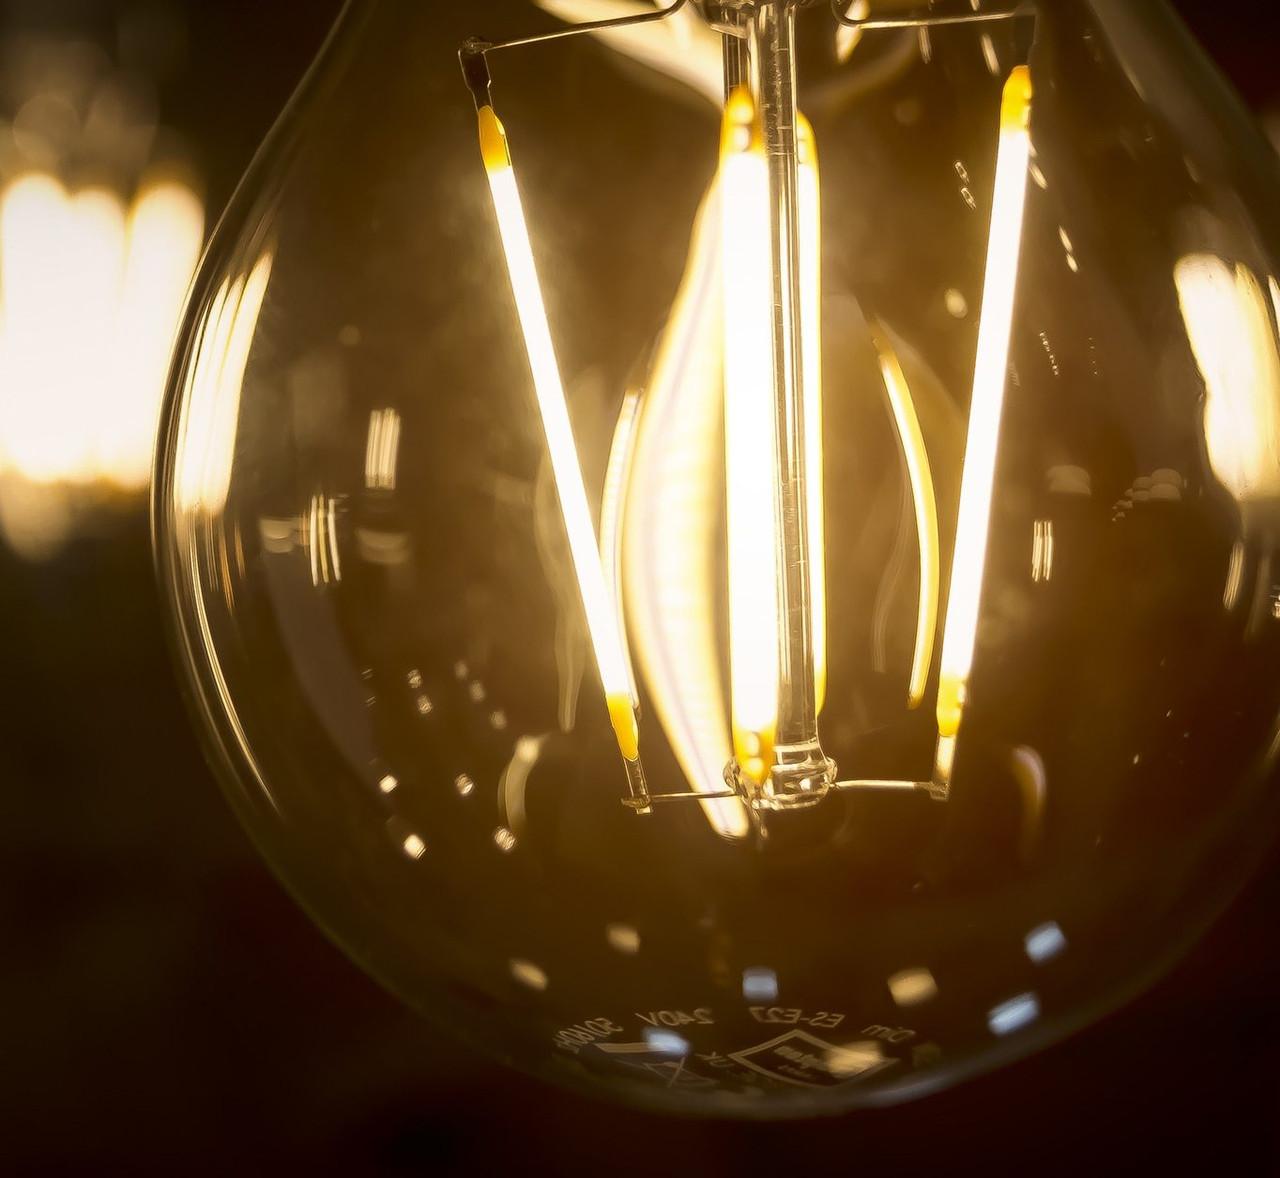 LED GLS 40W Equivalent Light Bulbs